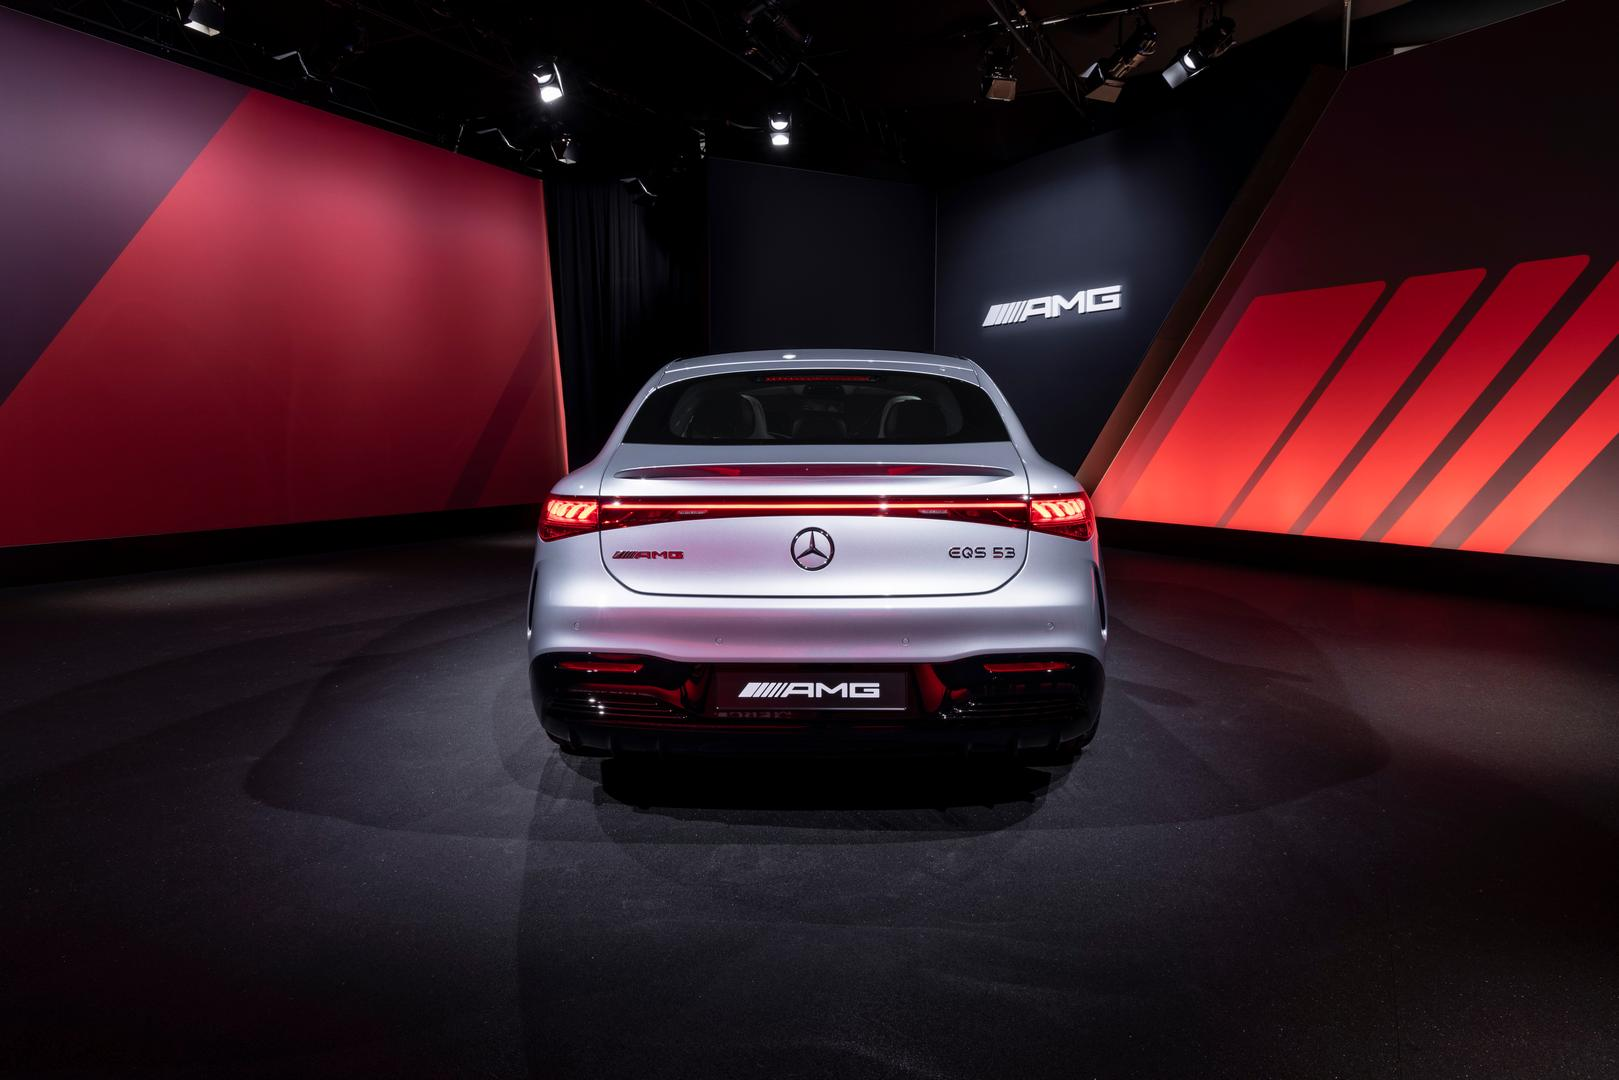 Mercedes-AMG EQS 53 4MATIC+, 2021Mercedes-AMG EQS 53 rear